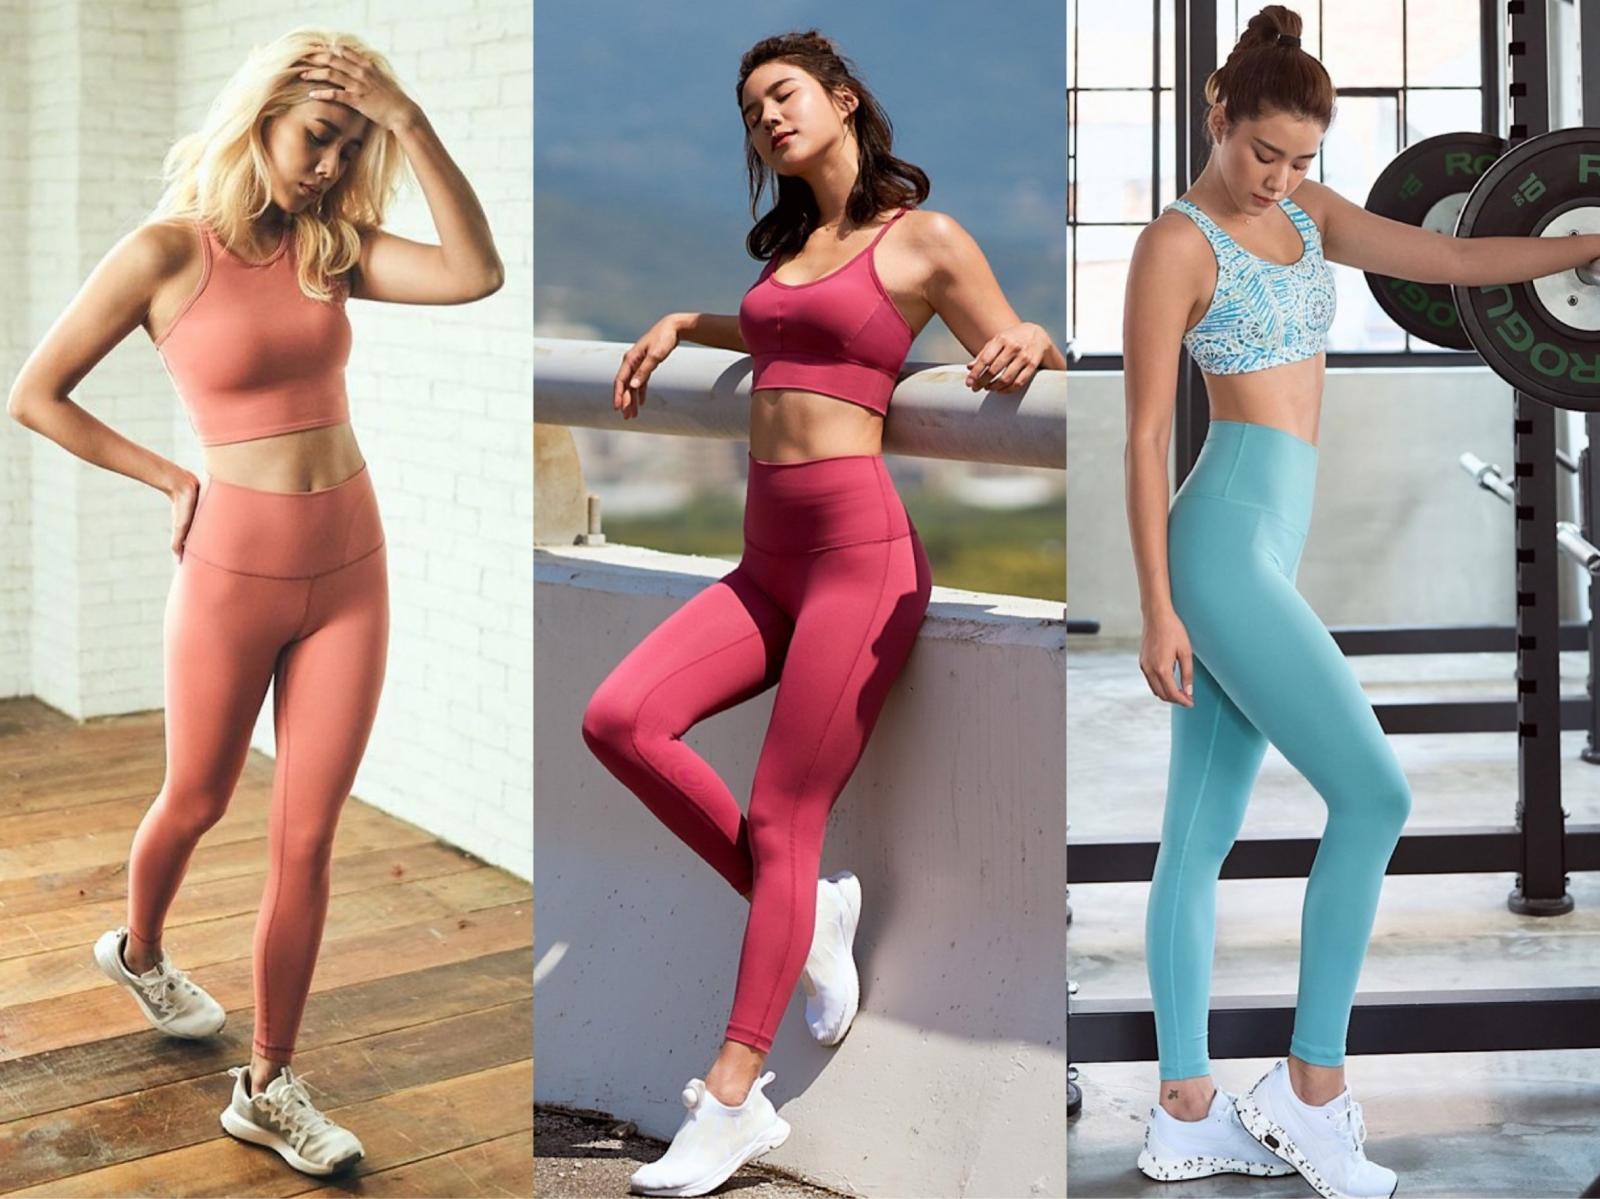 《VCstyle》推出的女性運動內衣在Dcard討論度超高,被定位為中價位高CP值、小資女的最愛牌